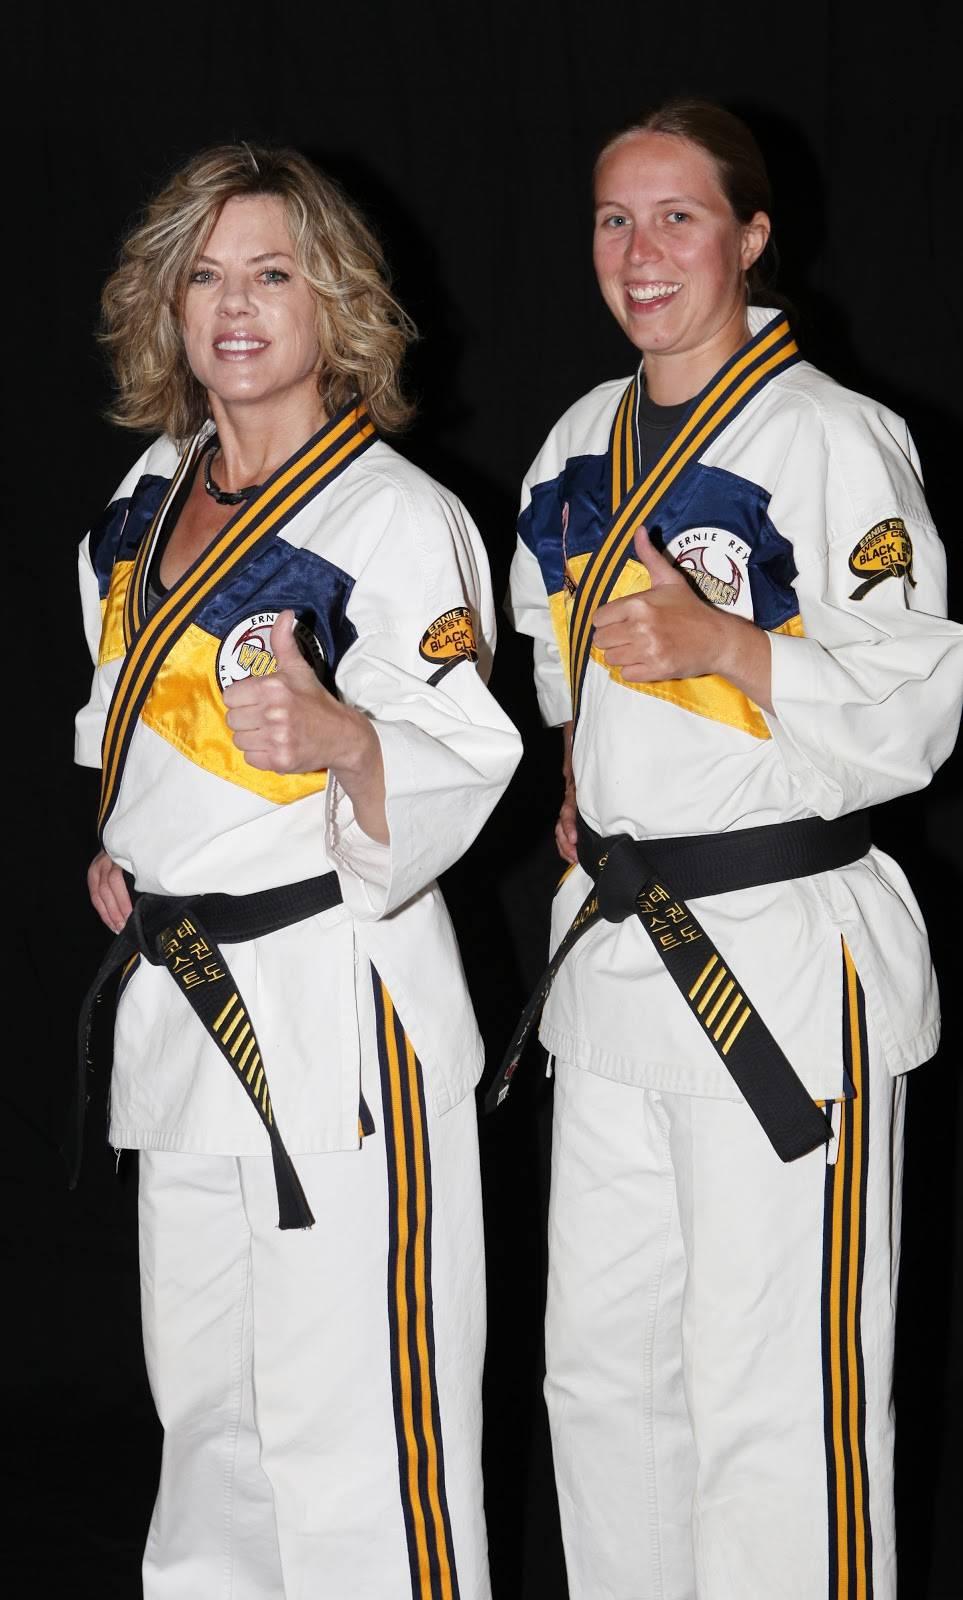 Ernie Reyes West Coast World Martial Arts - gym    Photo 4 of 8   Address: 1297 Baring Blvd, Sparks, NV 89434, USA   Phone: (775) 331-1669